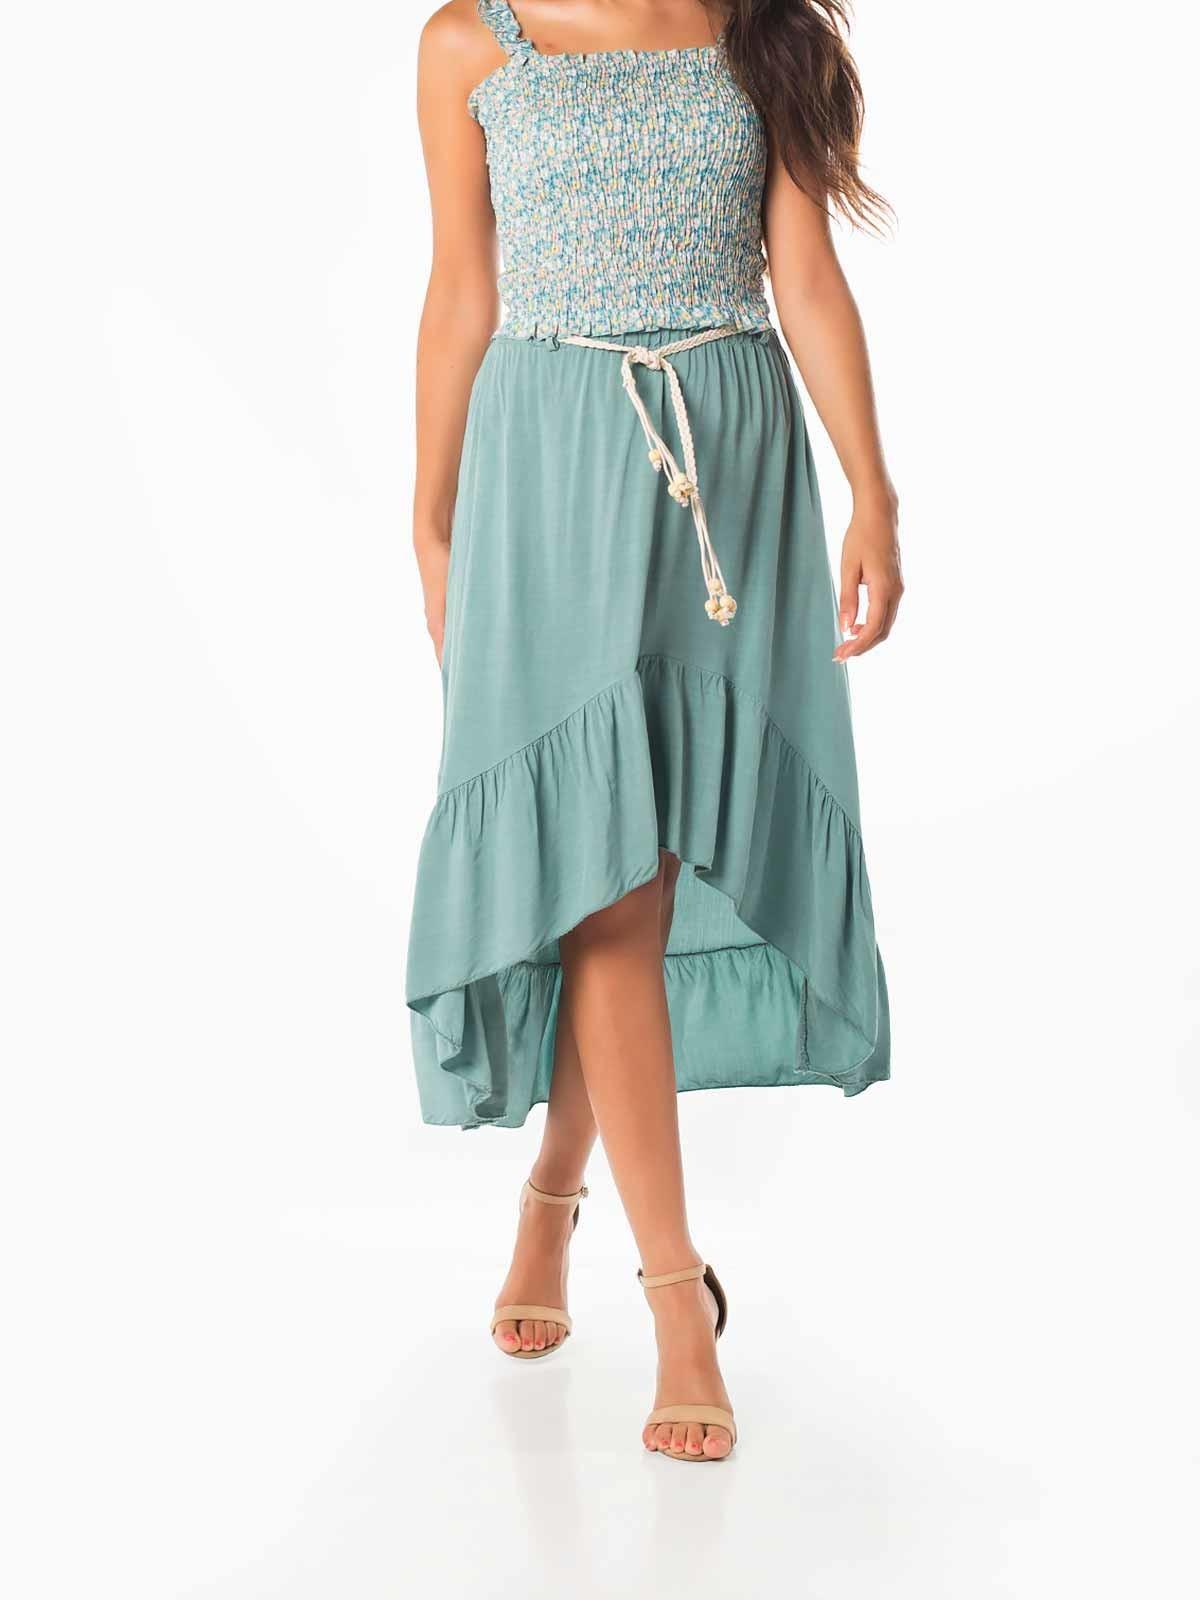 Falda midi asimétrica con cinturón